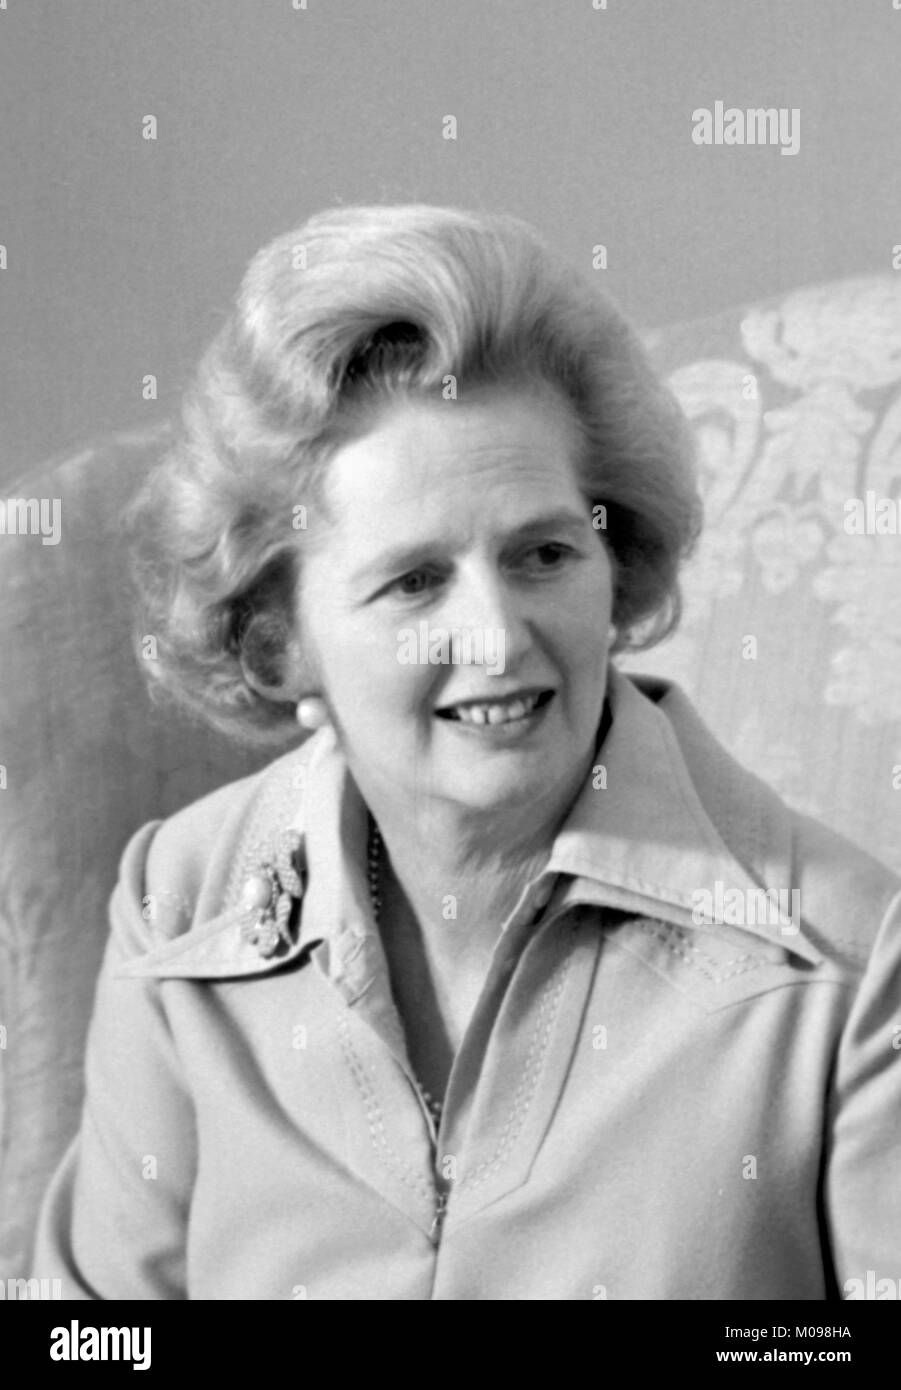 Margaret Thatcher (1925-2013). Portrait of the British Prime Minister in September 1975, photo by Marion S Trikosko. - Stock Image